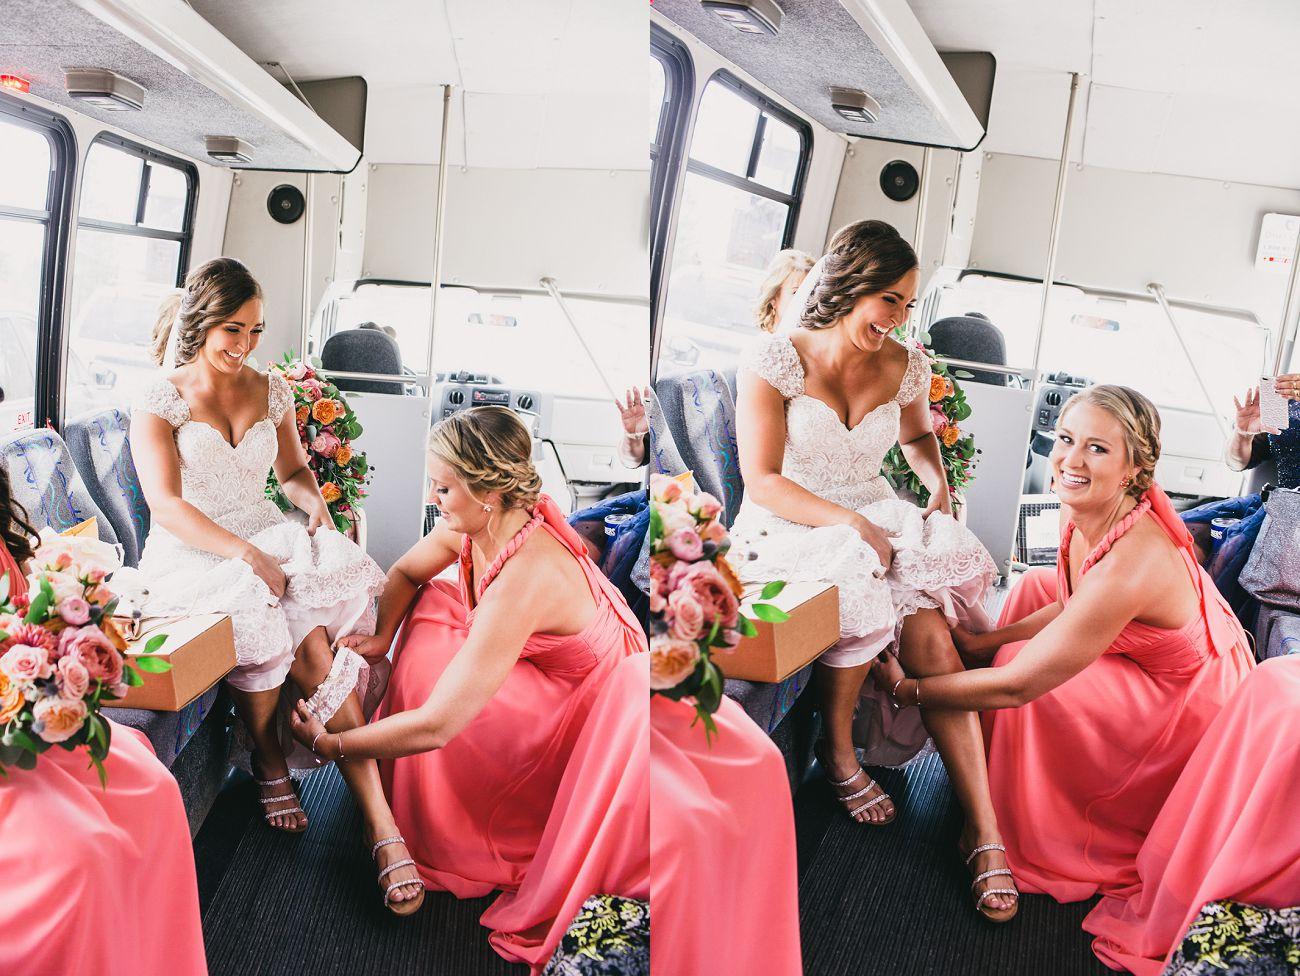 Jennifer_Mooney_Photo_Whitefish_Mountain_Resort_Wedding_00042.jpg